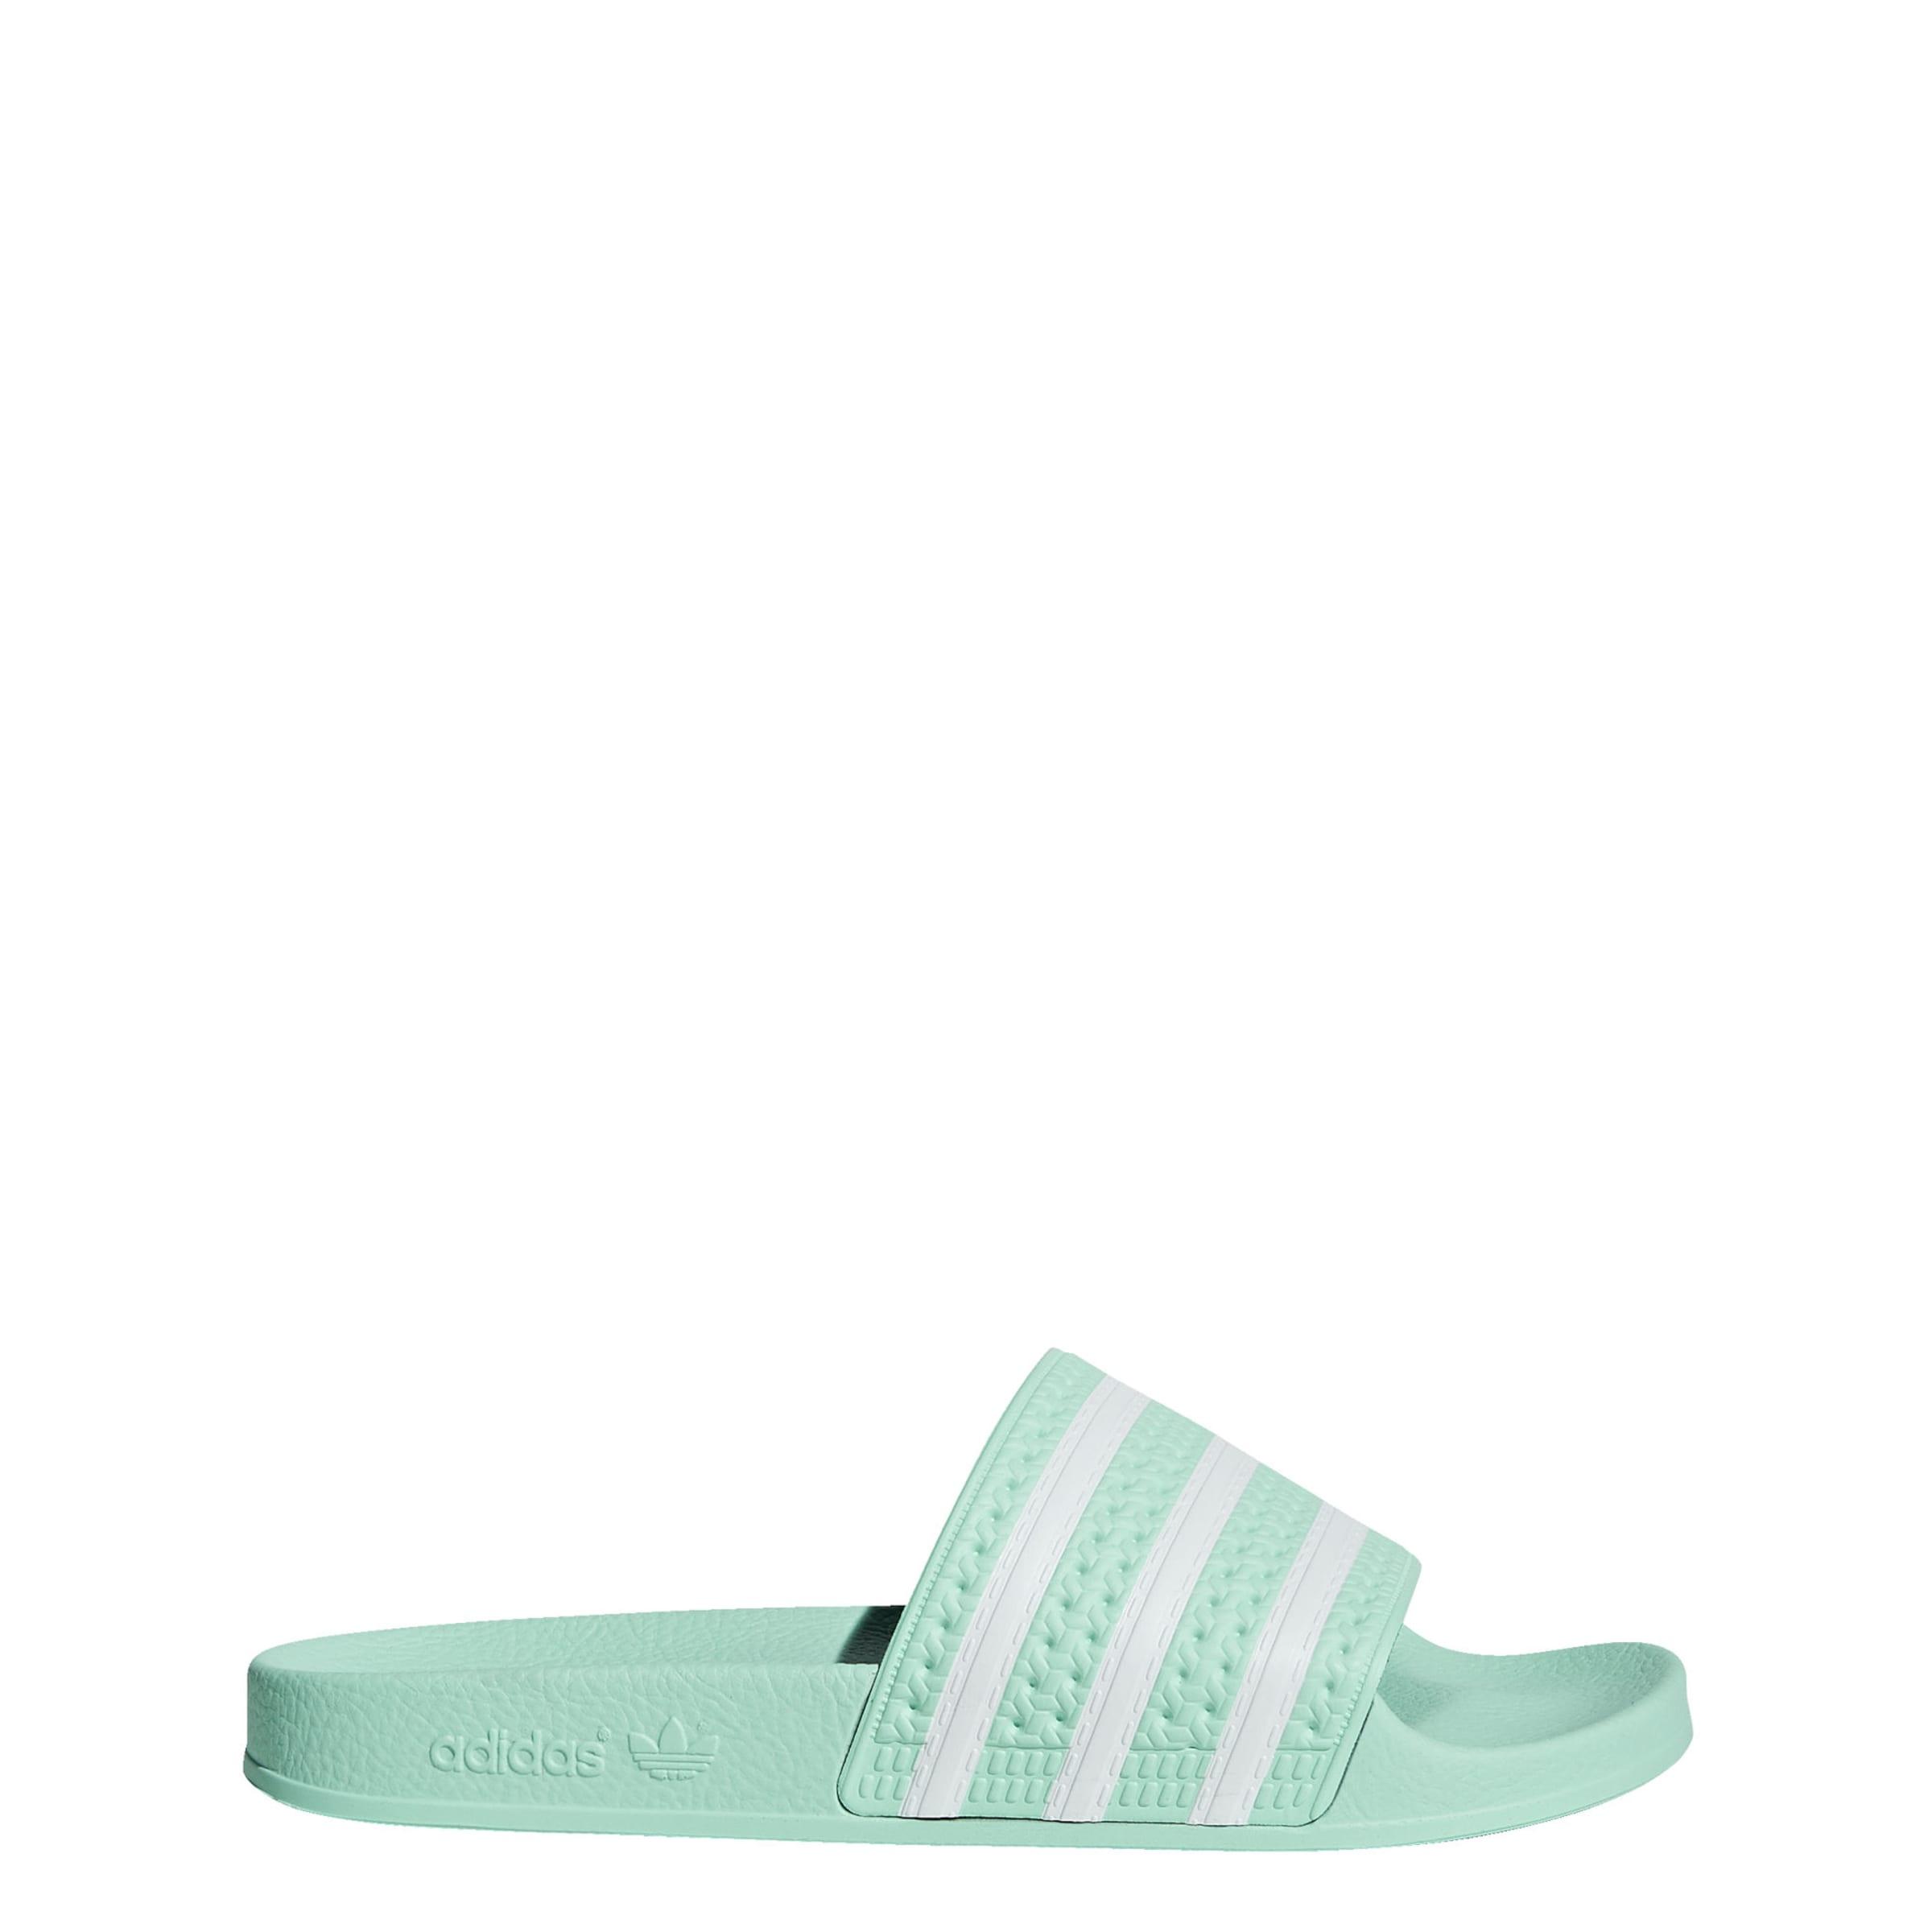 MentheBlanc 'adilette' Mule Adidas En Originals rWCoQxEdeB